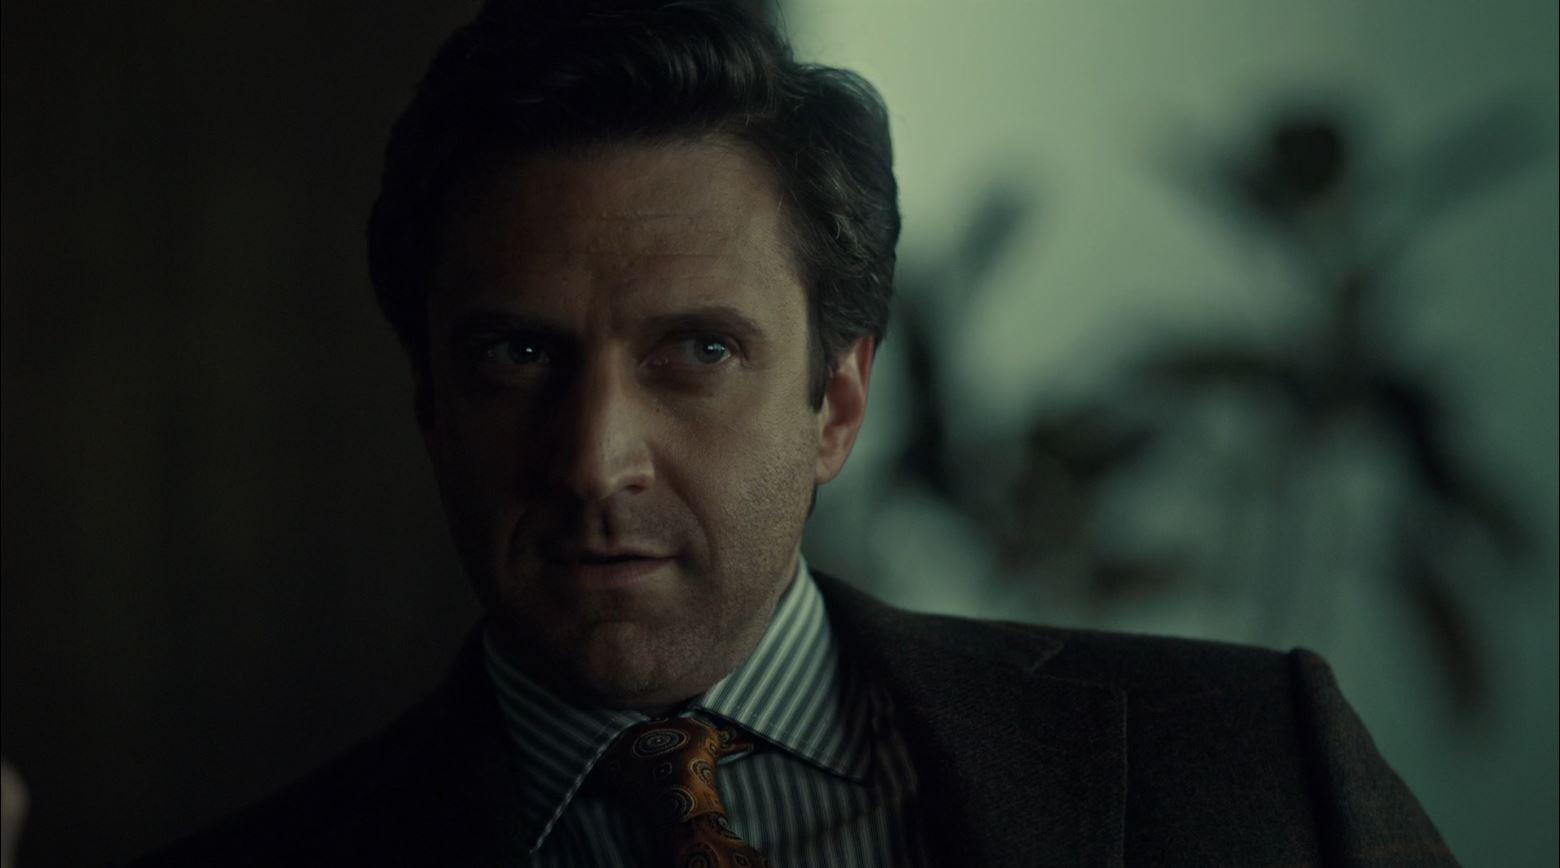 Hannibal S2Ep6 Futamono Review - Raúl Esparza as Dr. Frederick Chilton